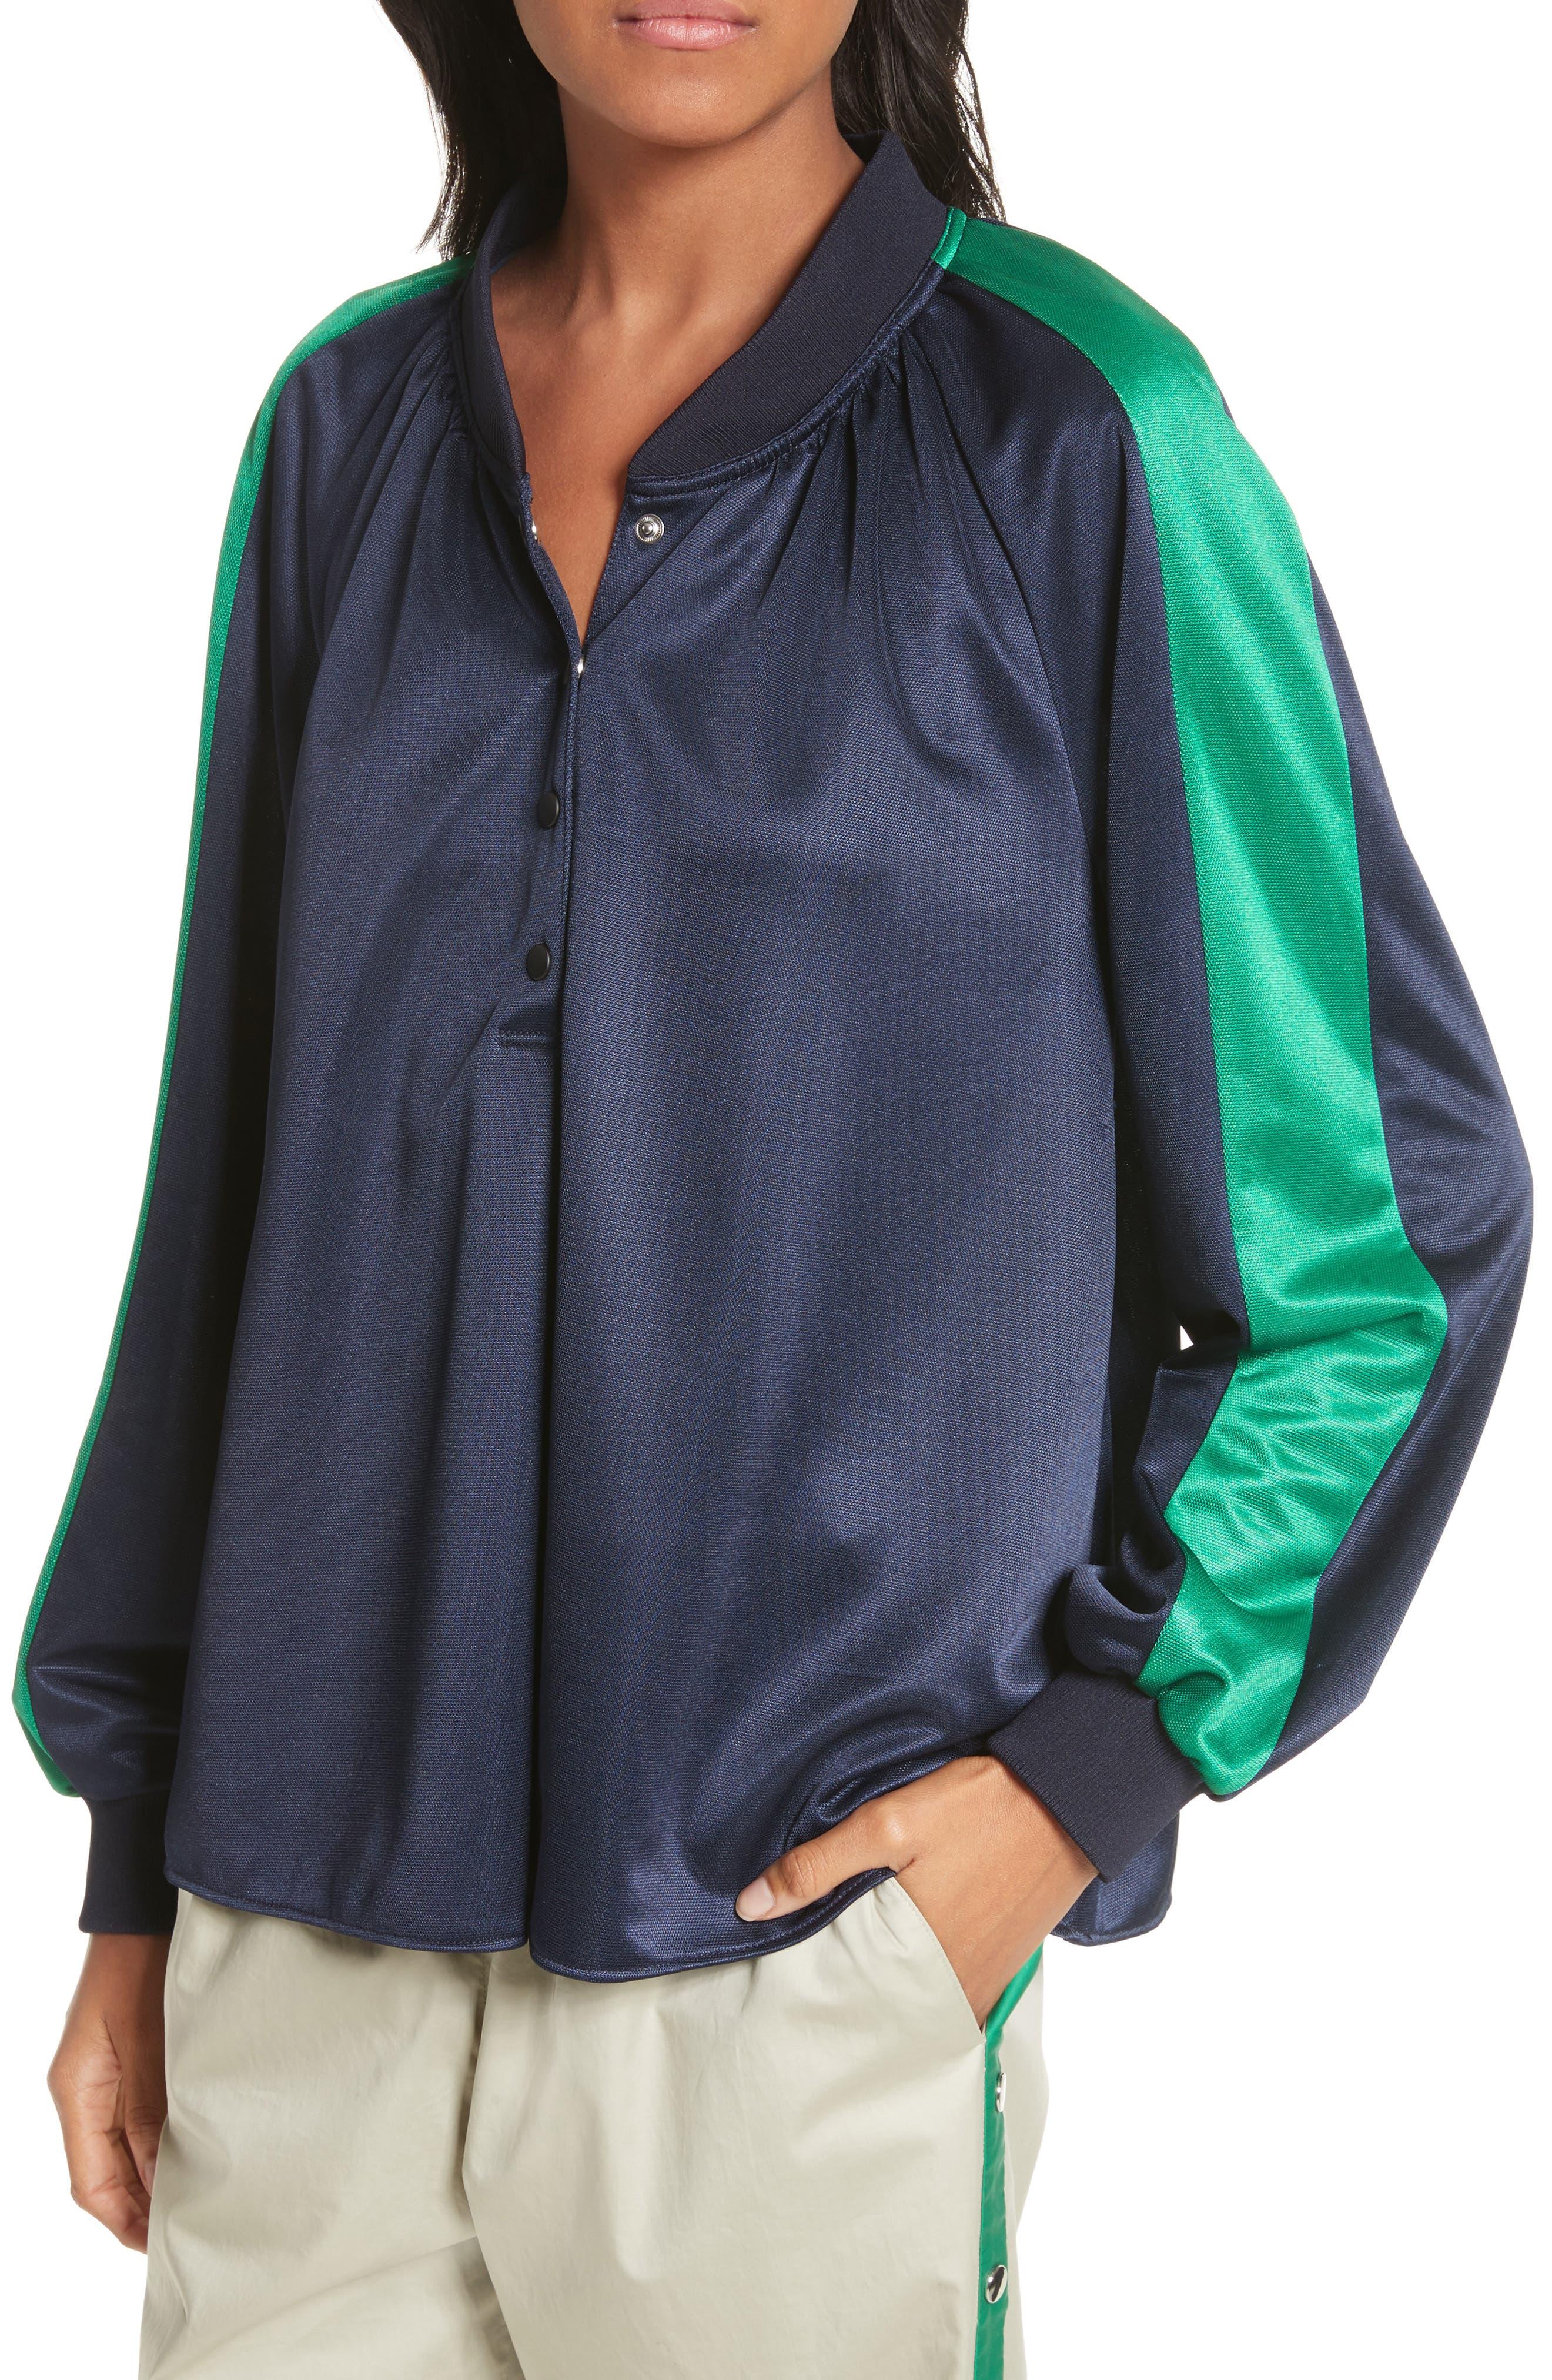 Pullover Track Jacket,                             Alternate thumbnail 4, color,                             Navy/ Green Multi